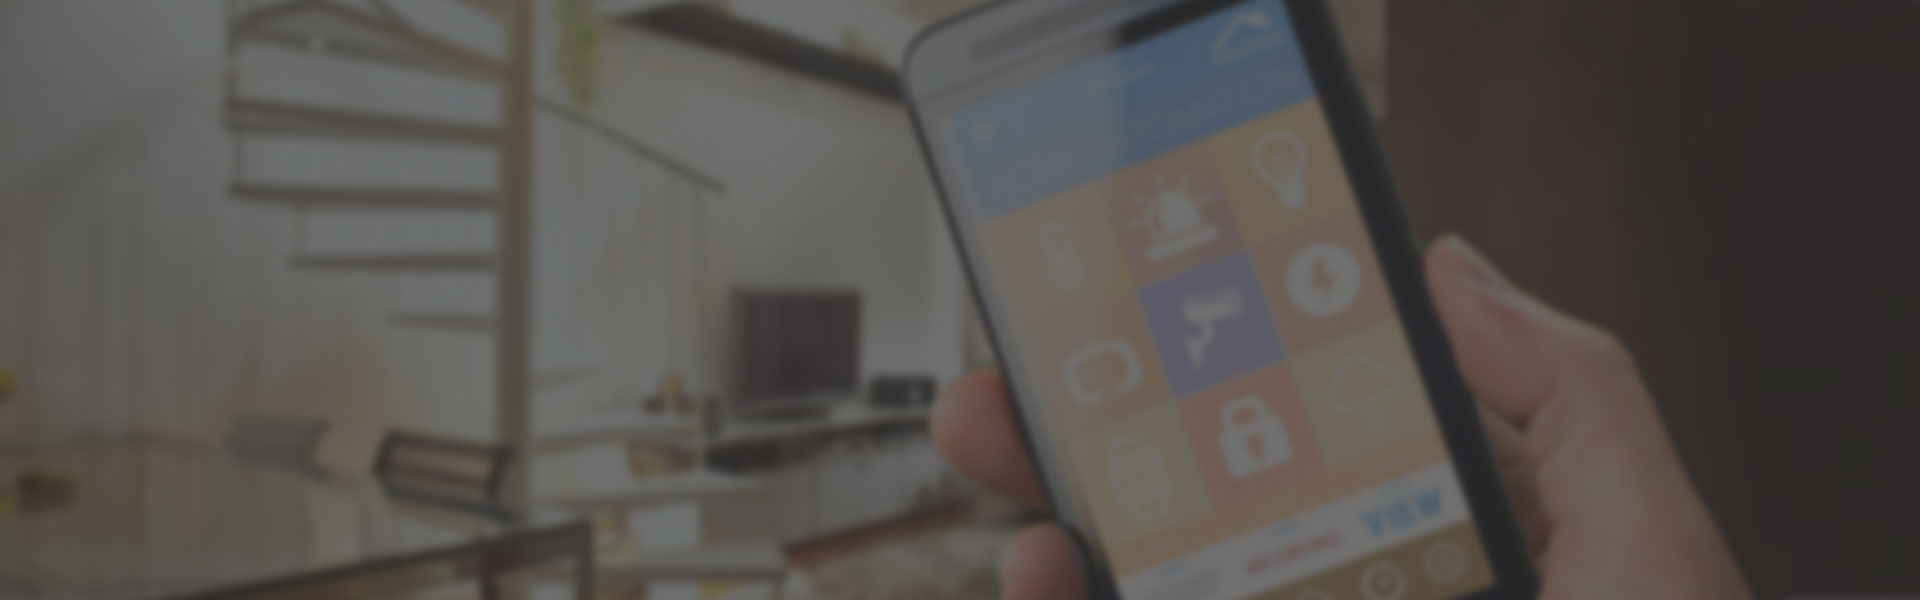 videosurveillance-mobile